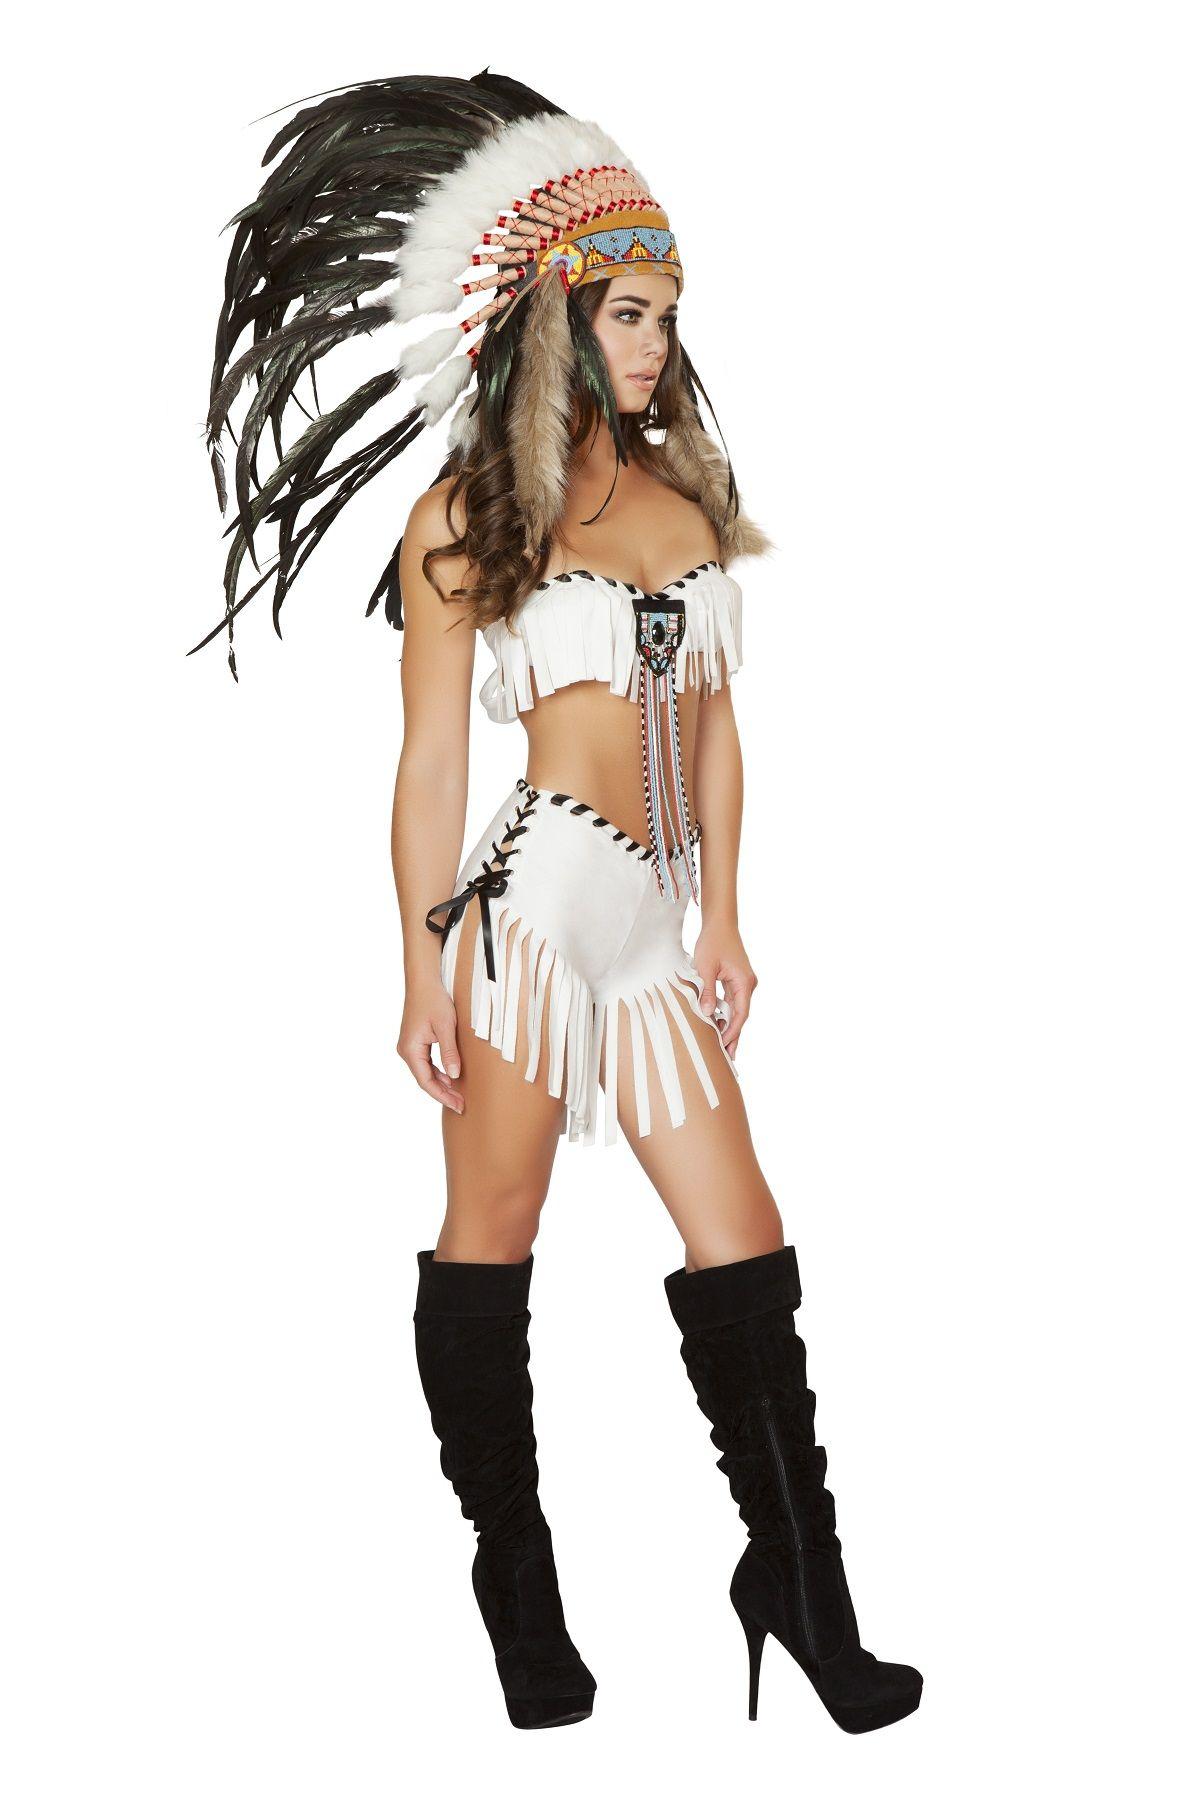 native american hot costume native american indian women tribal princess halloween costume - Halloween Native American Costumes